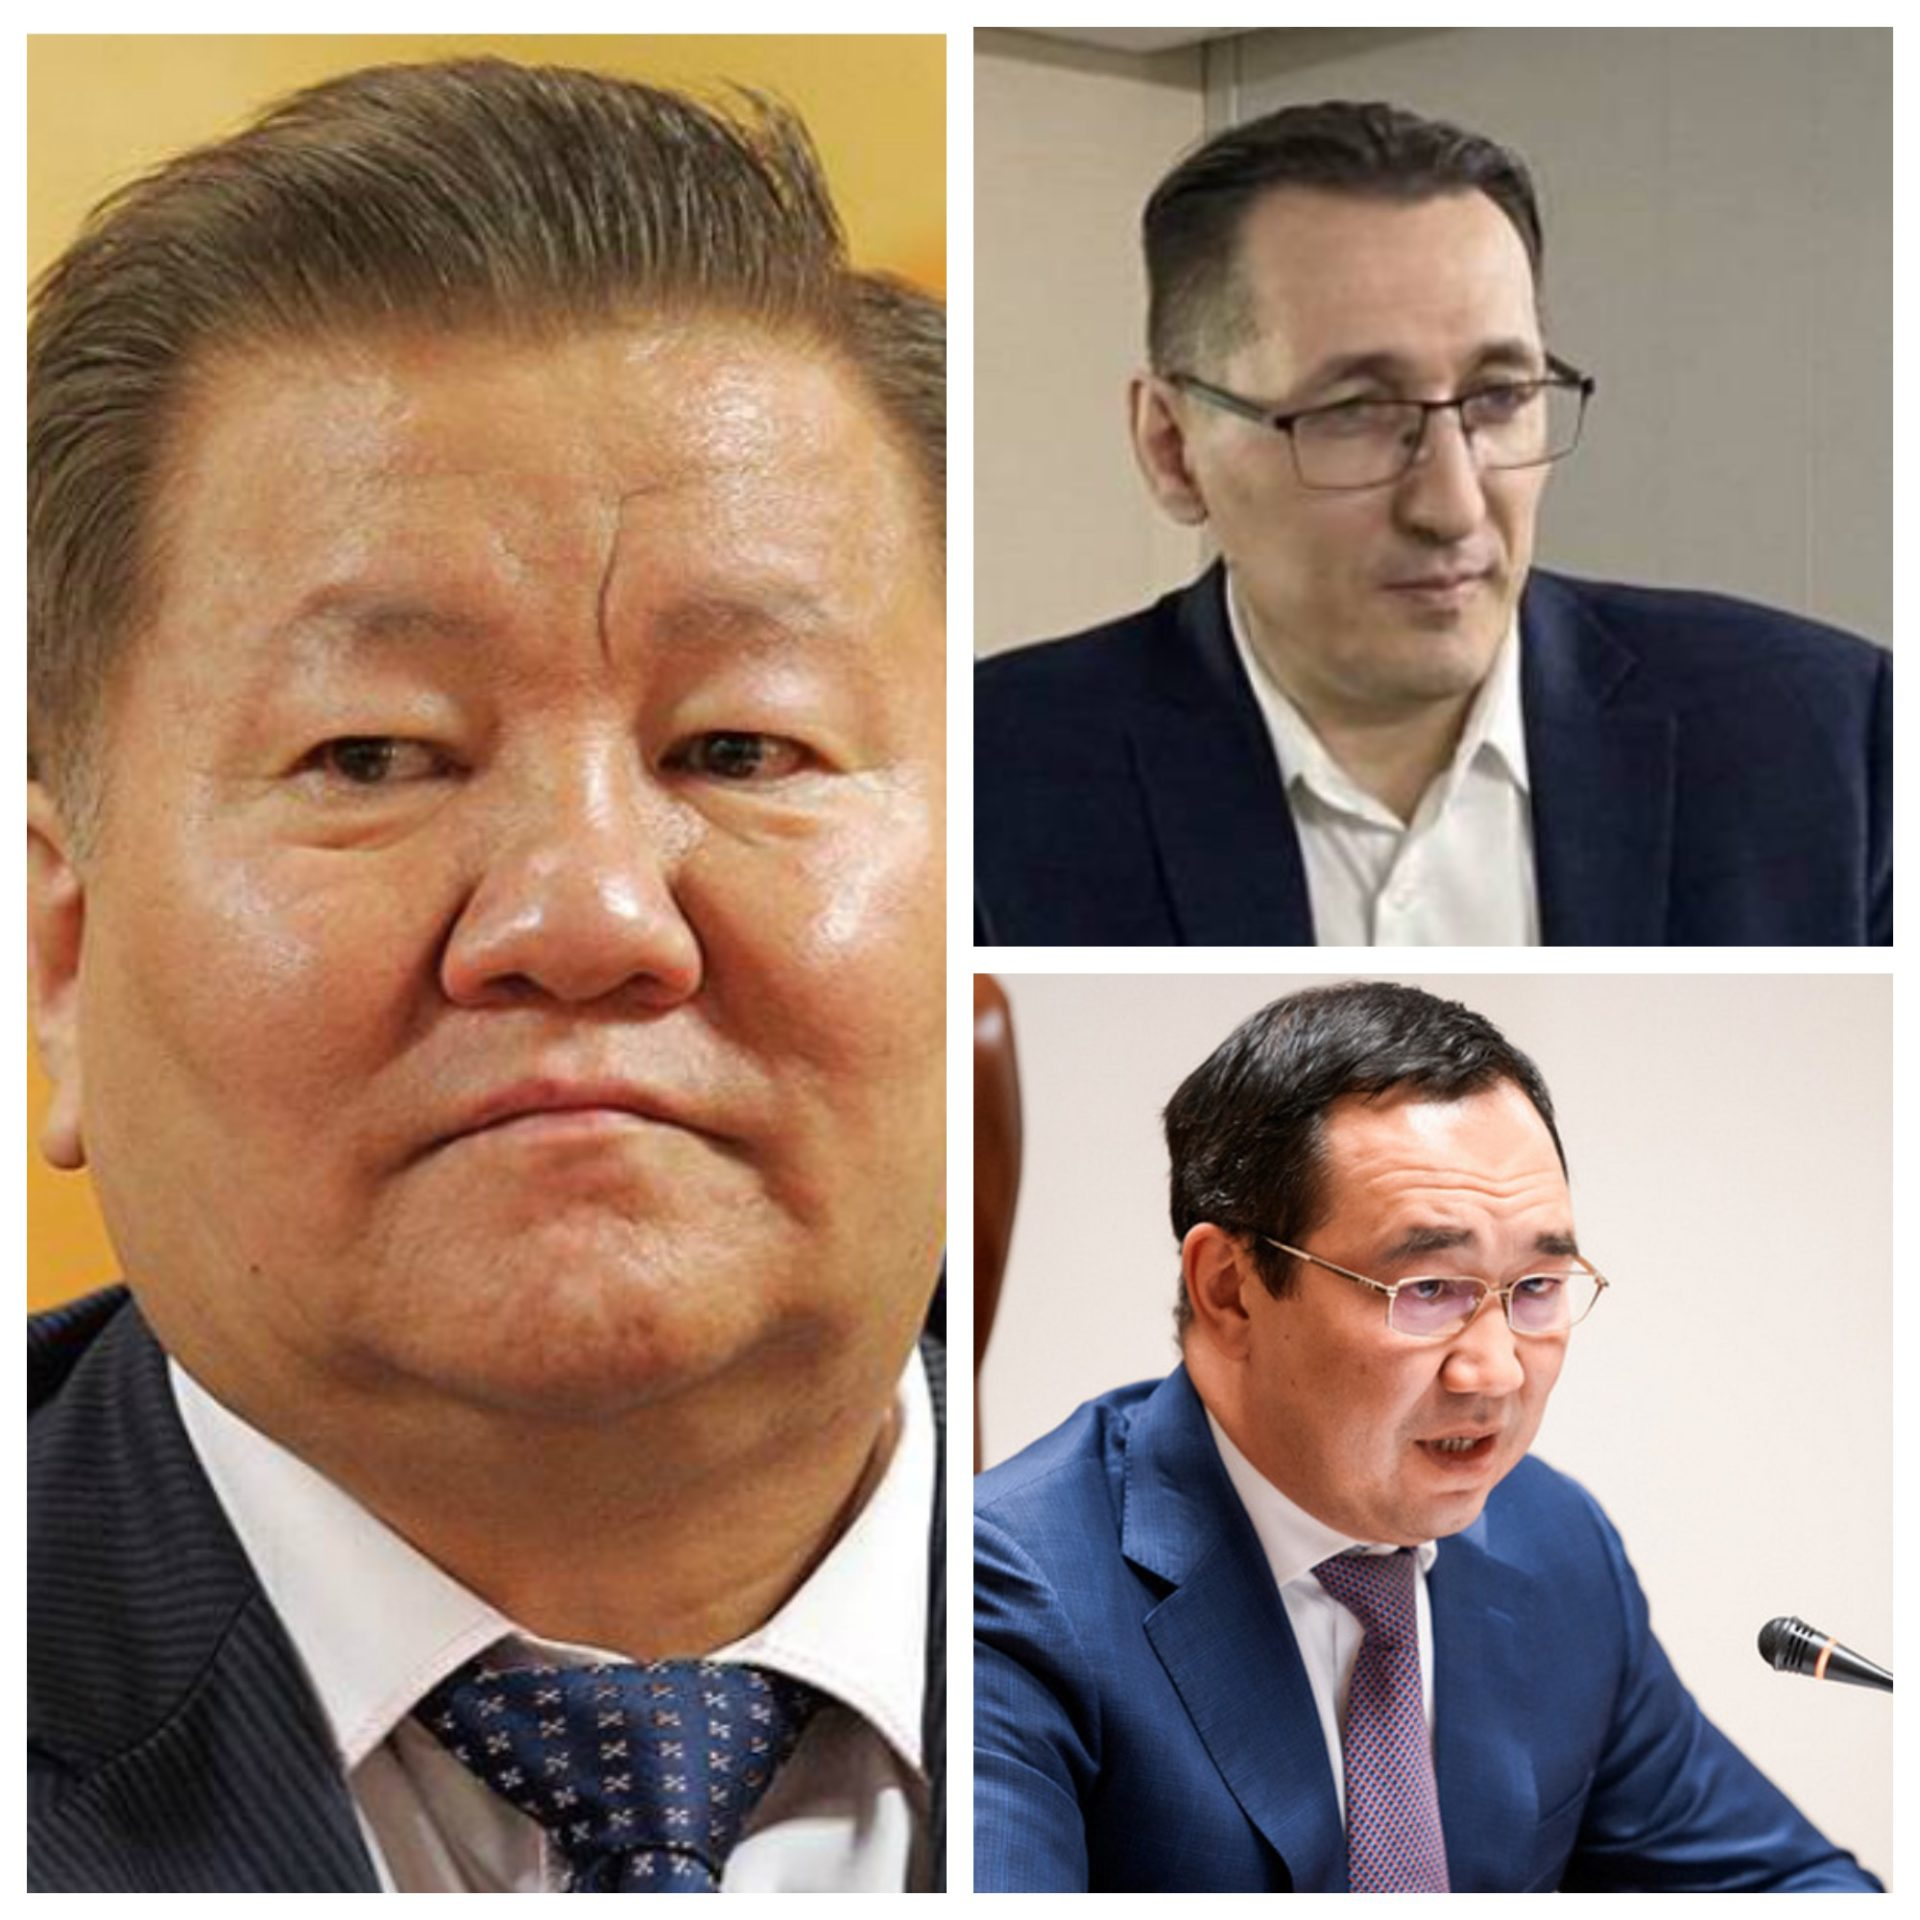 Выборы мэра Якутска — тест в Госдуму